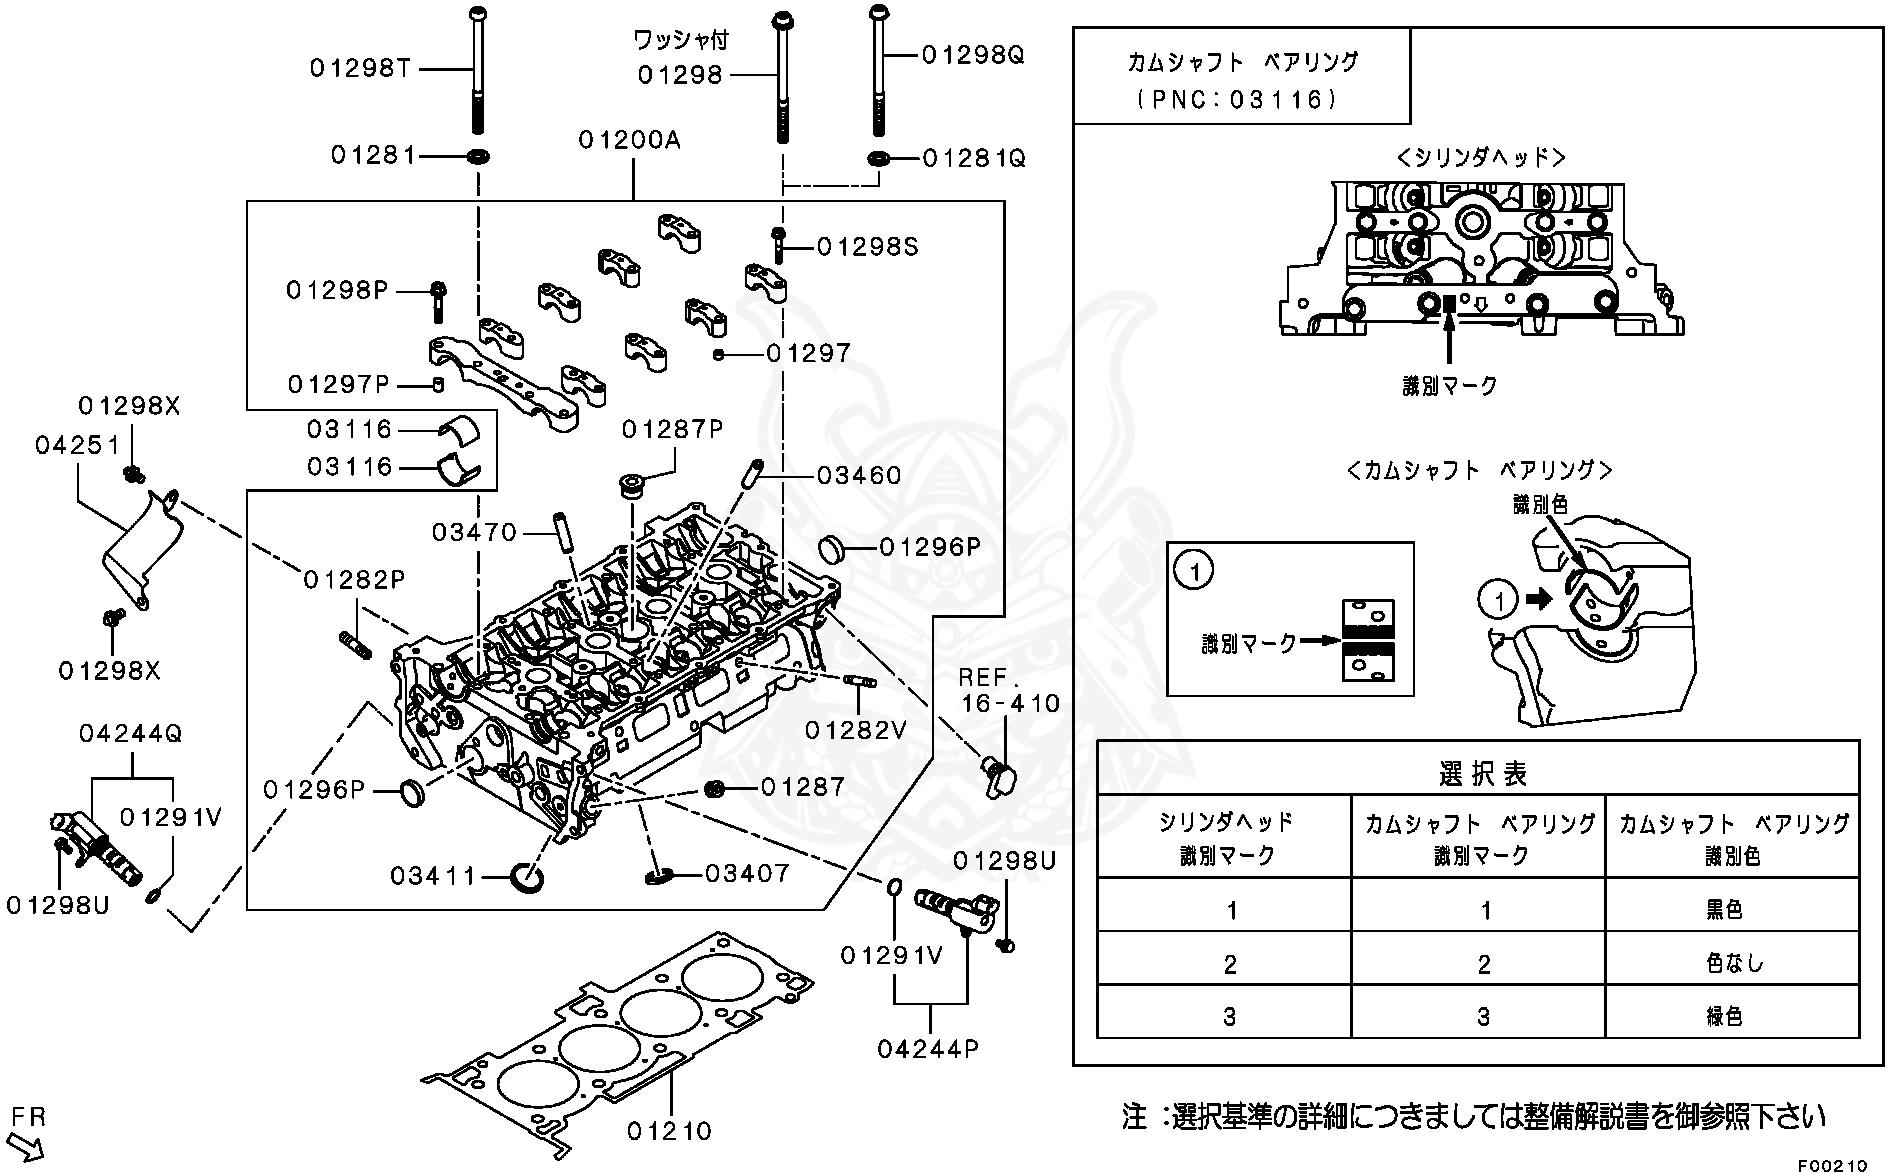 Mitsubishi - Bushing, Cylinder Head